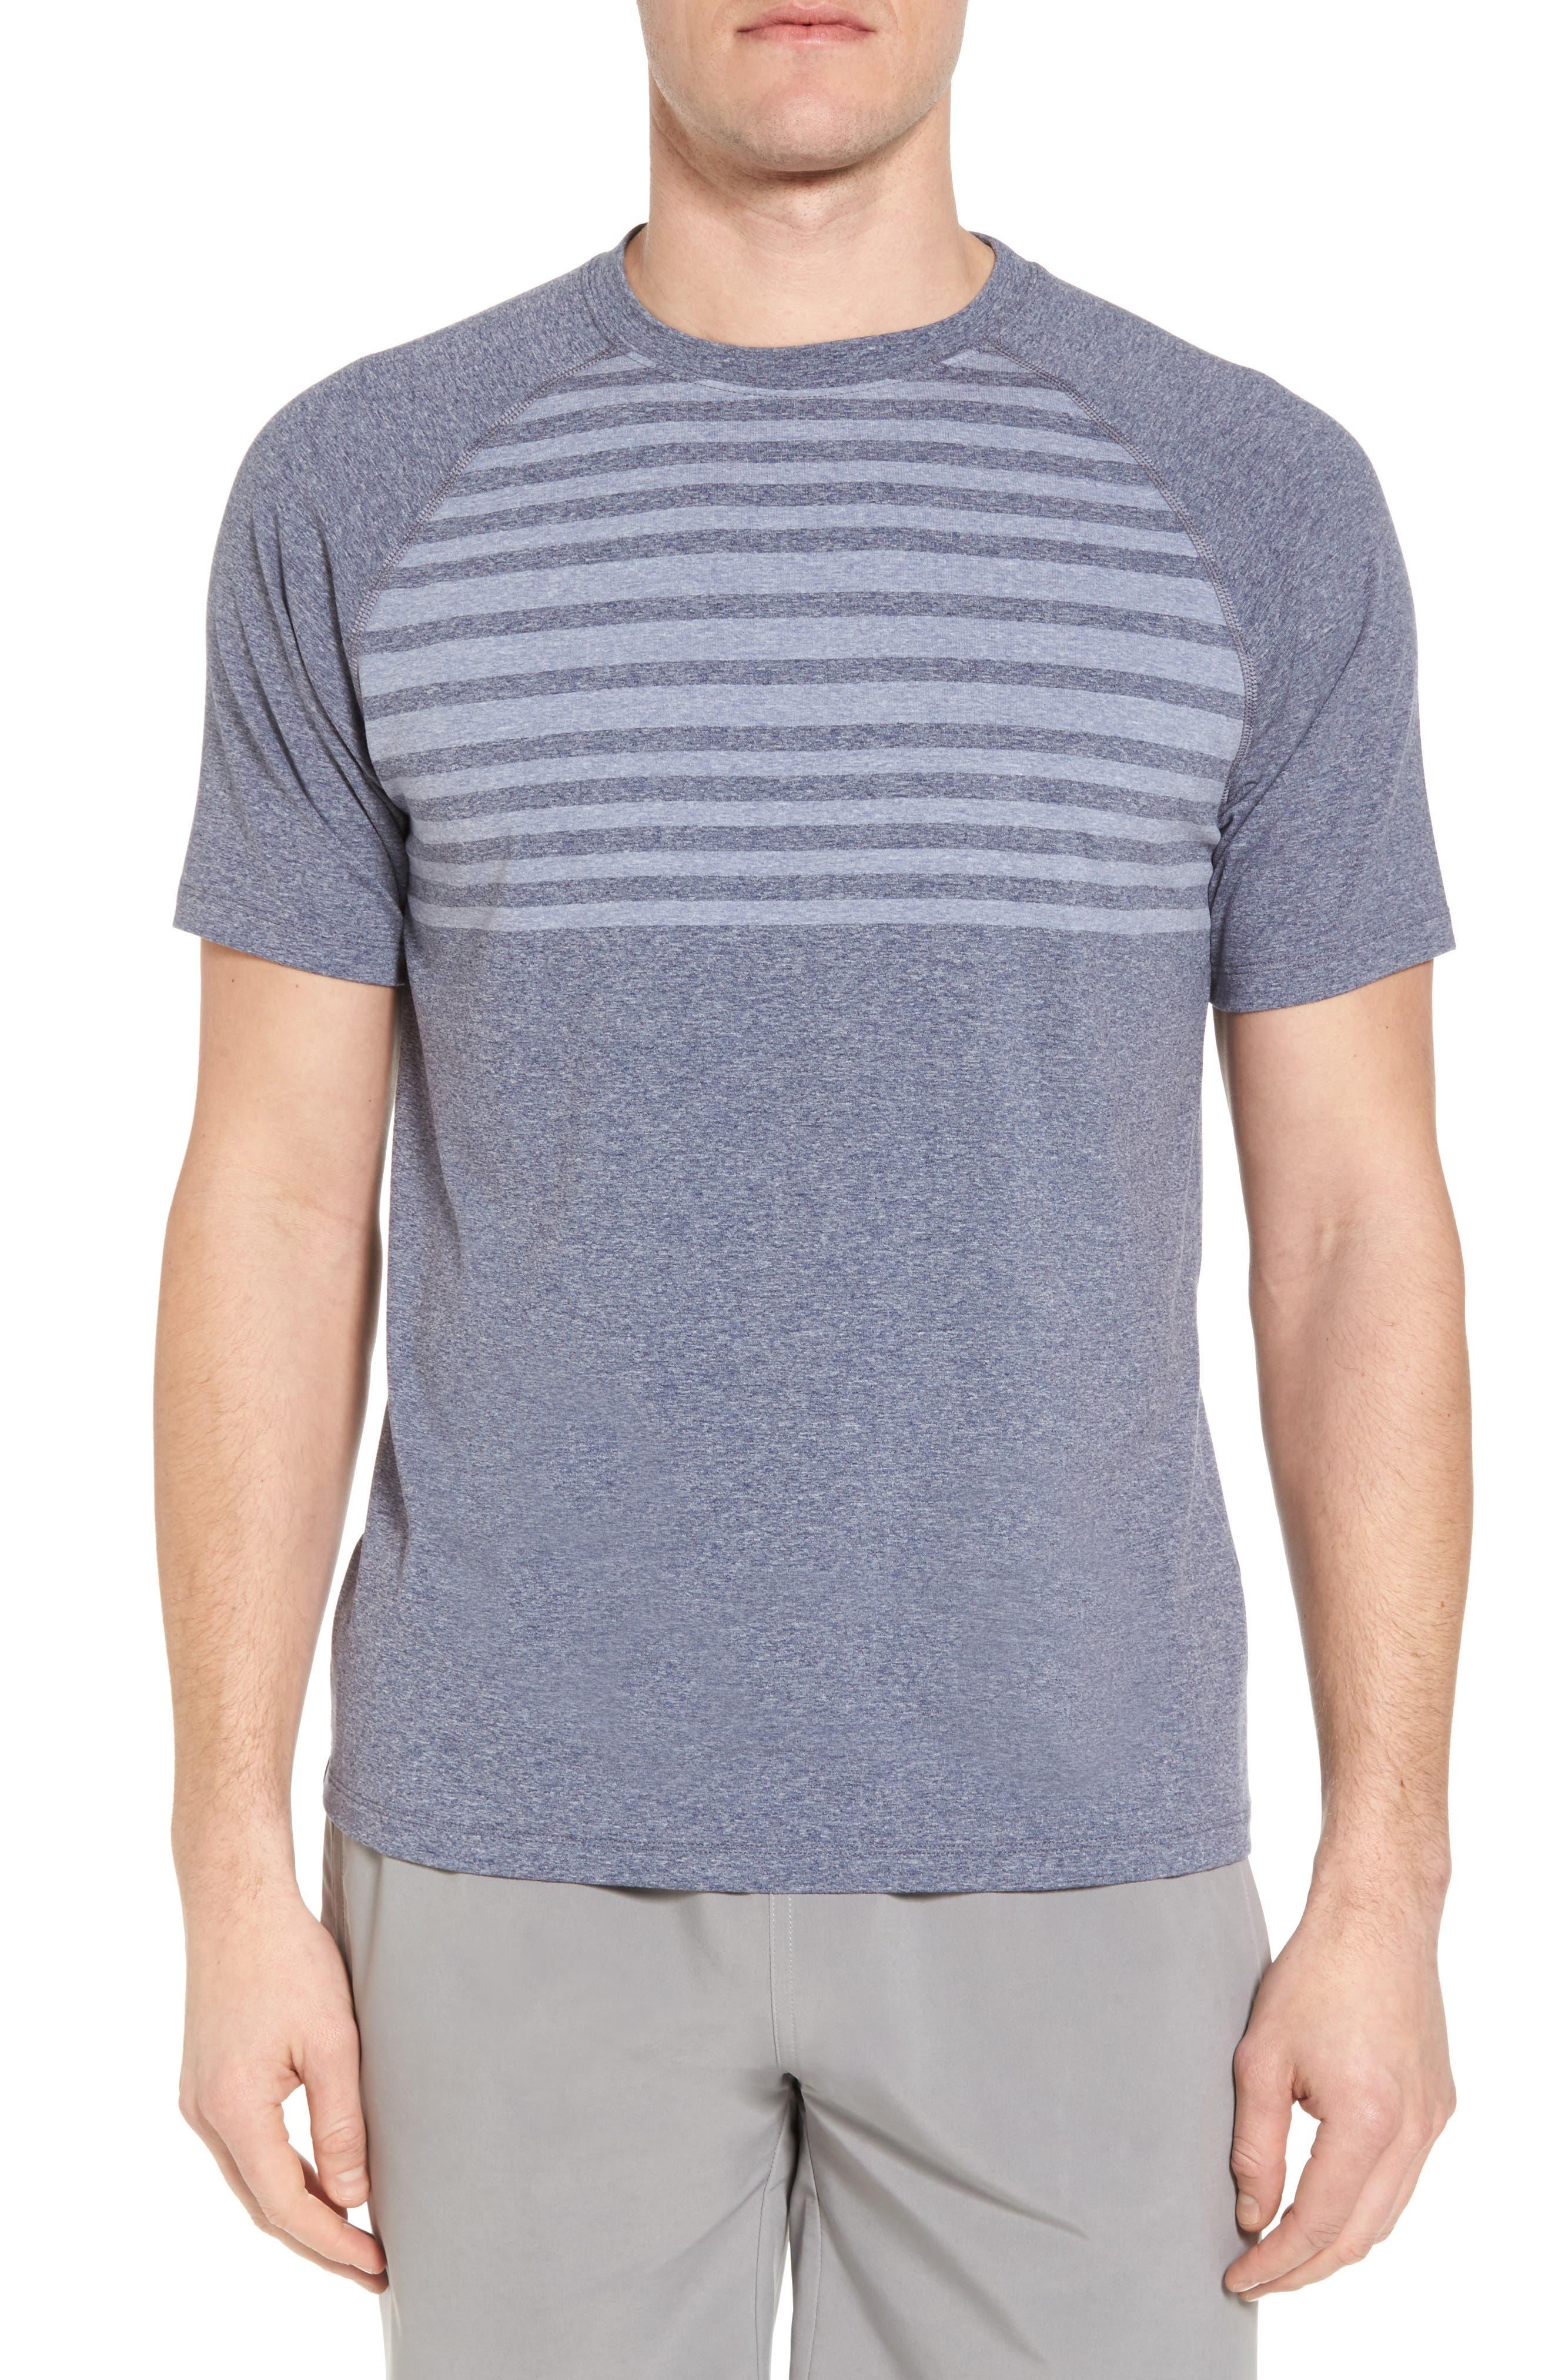 Peter Millar Rio Stripe Technical T-Shirt